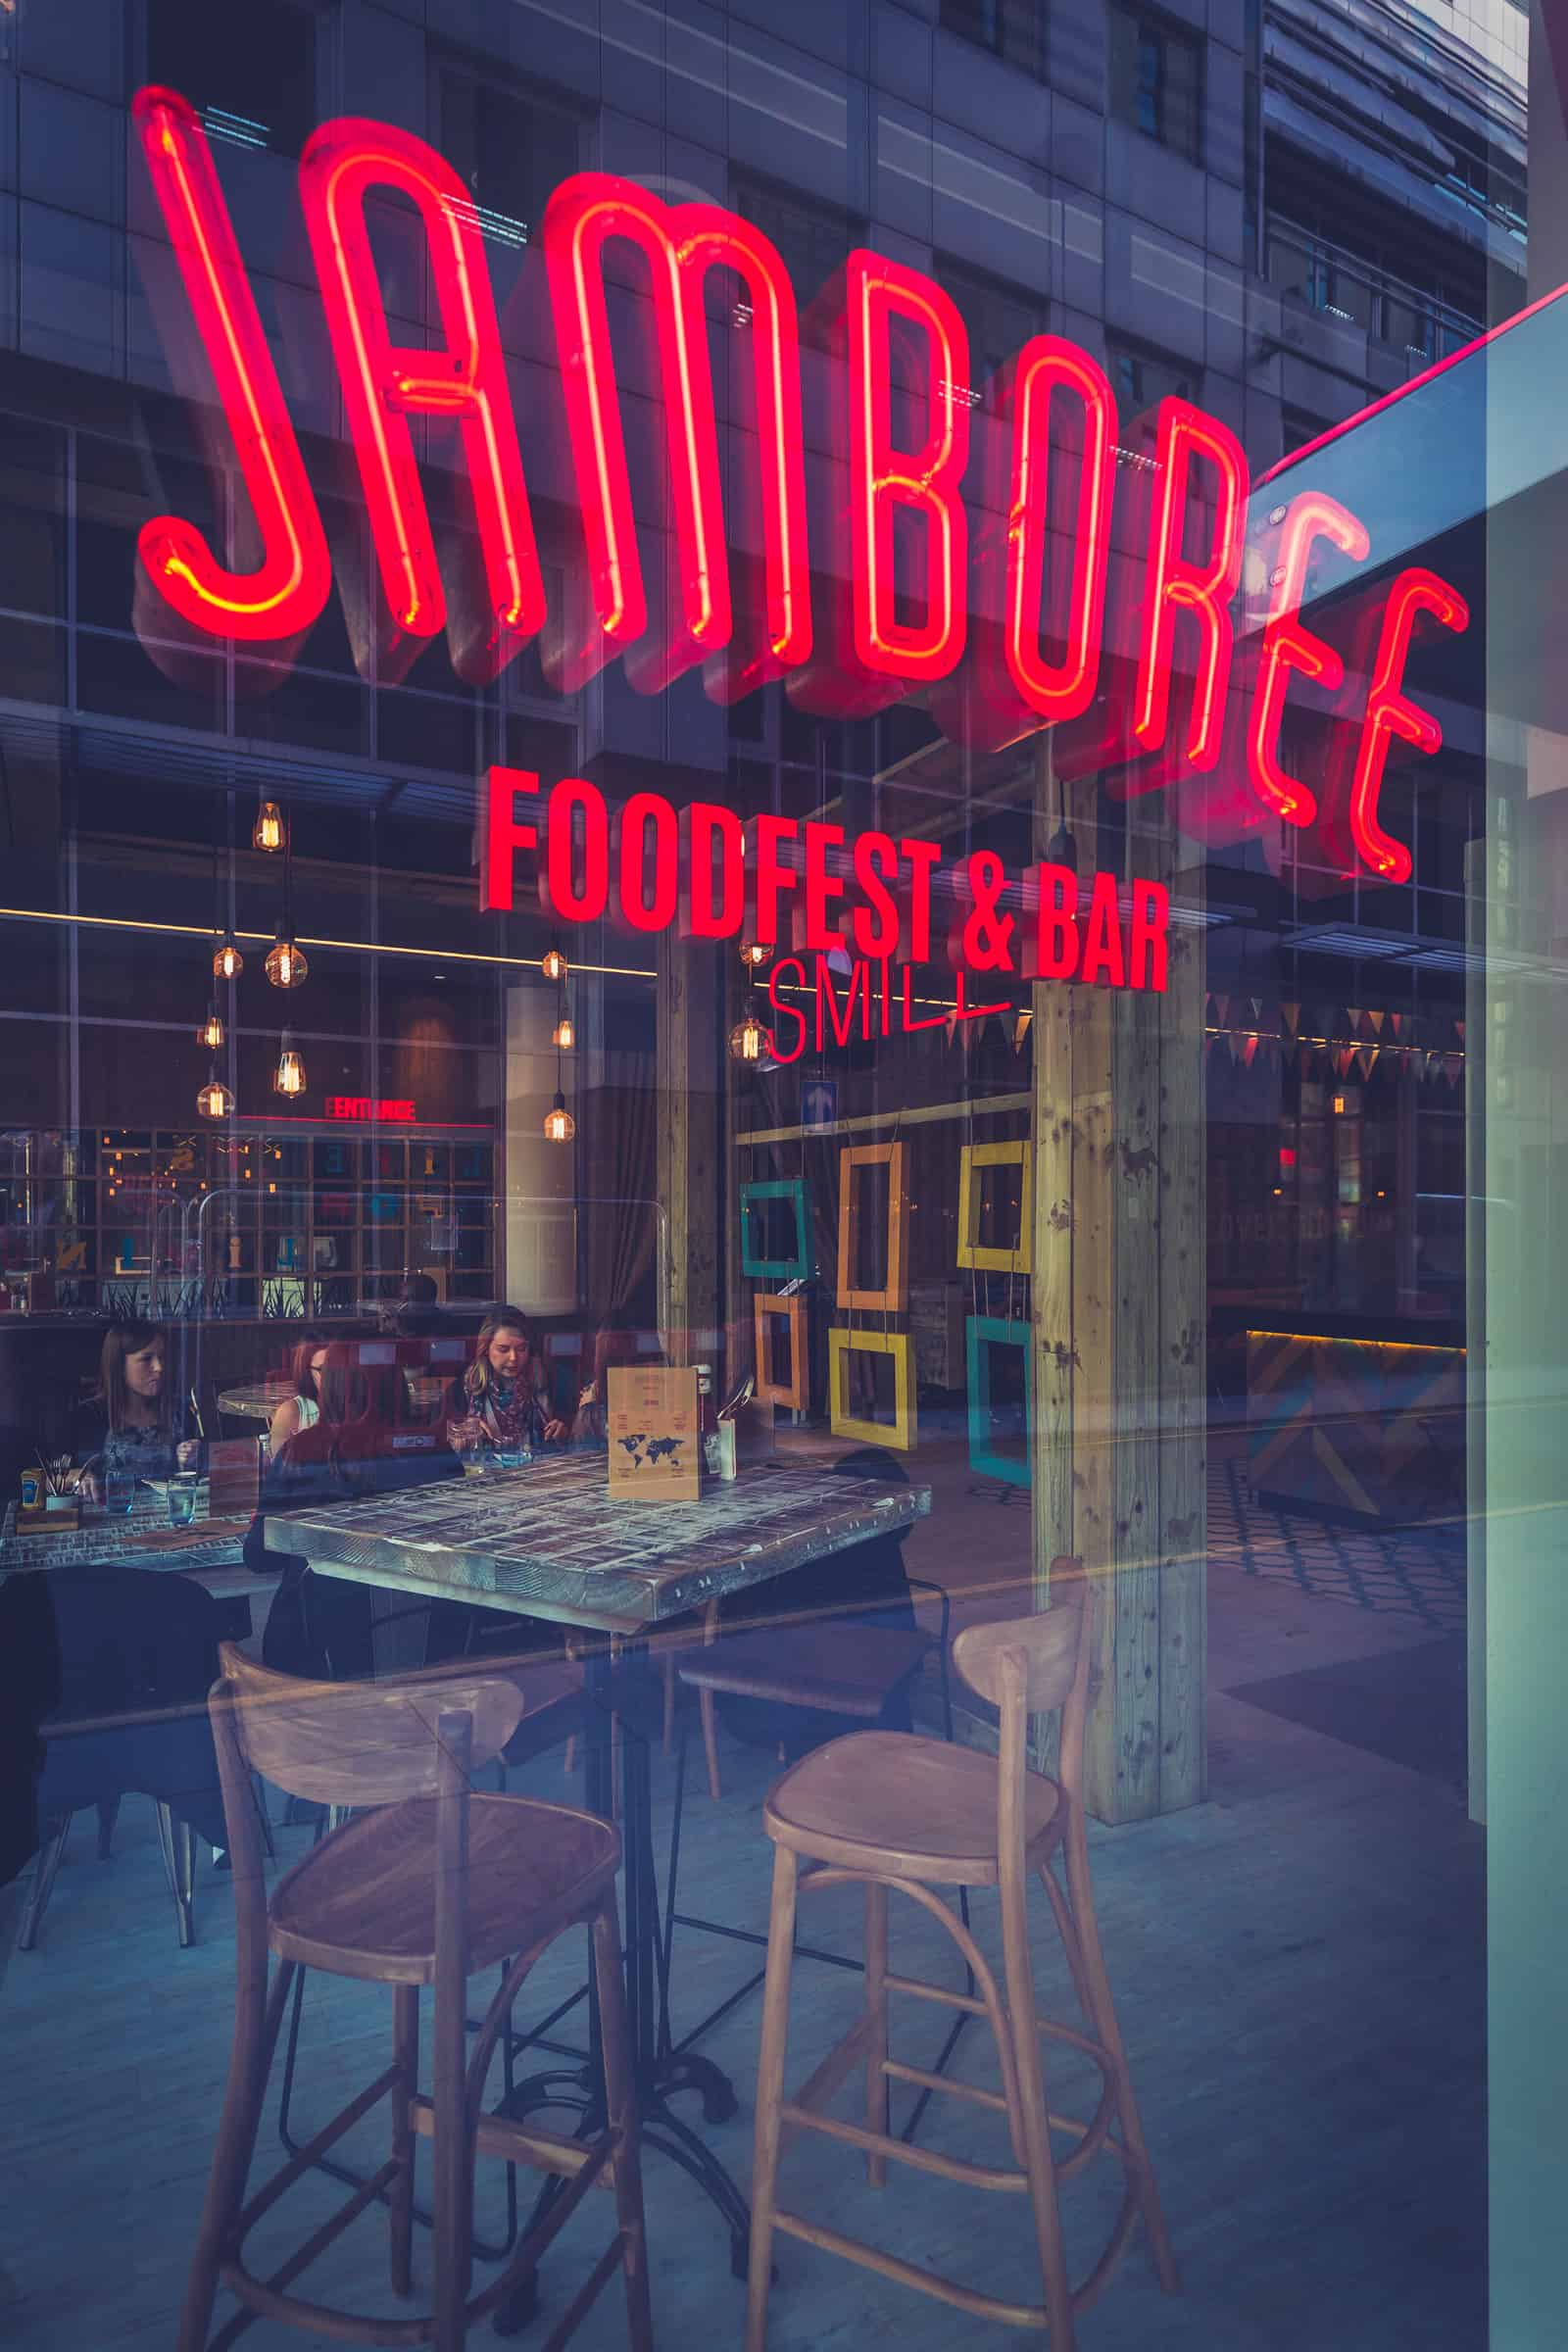 Launching a restaurant brand digitally